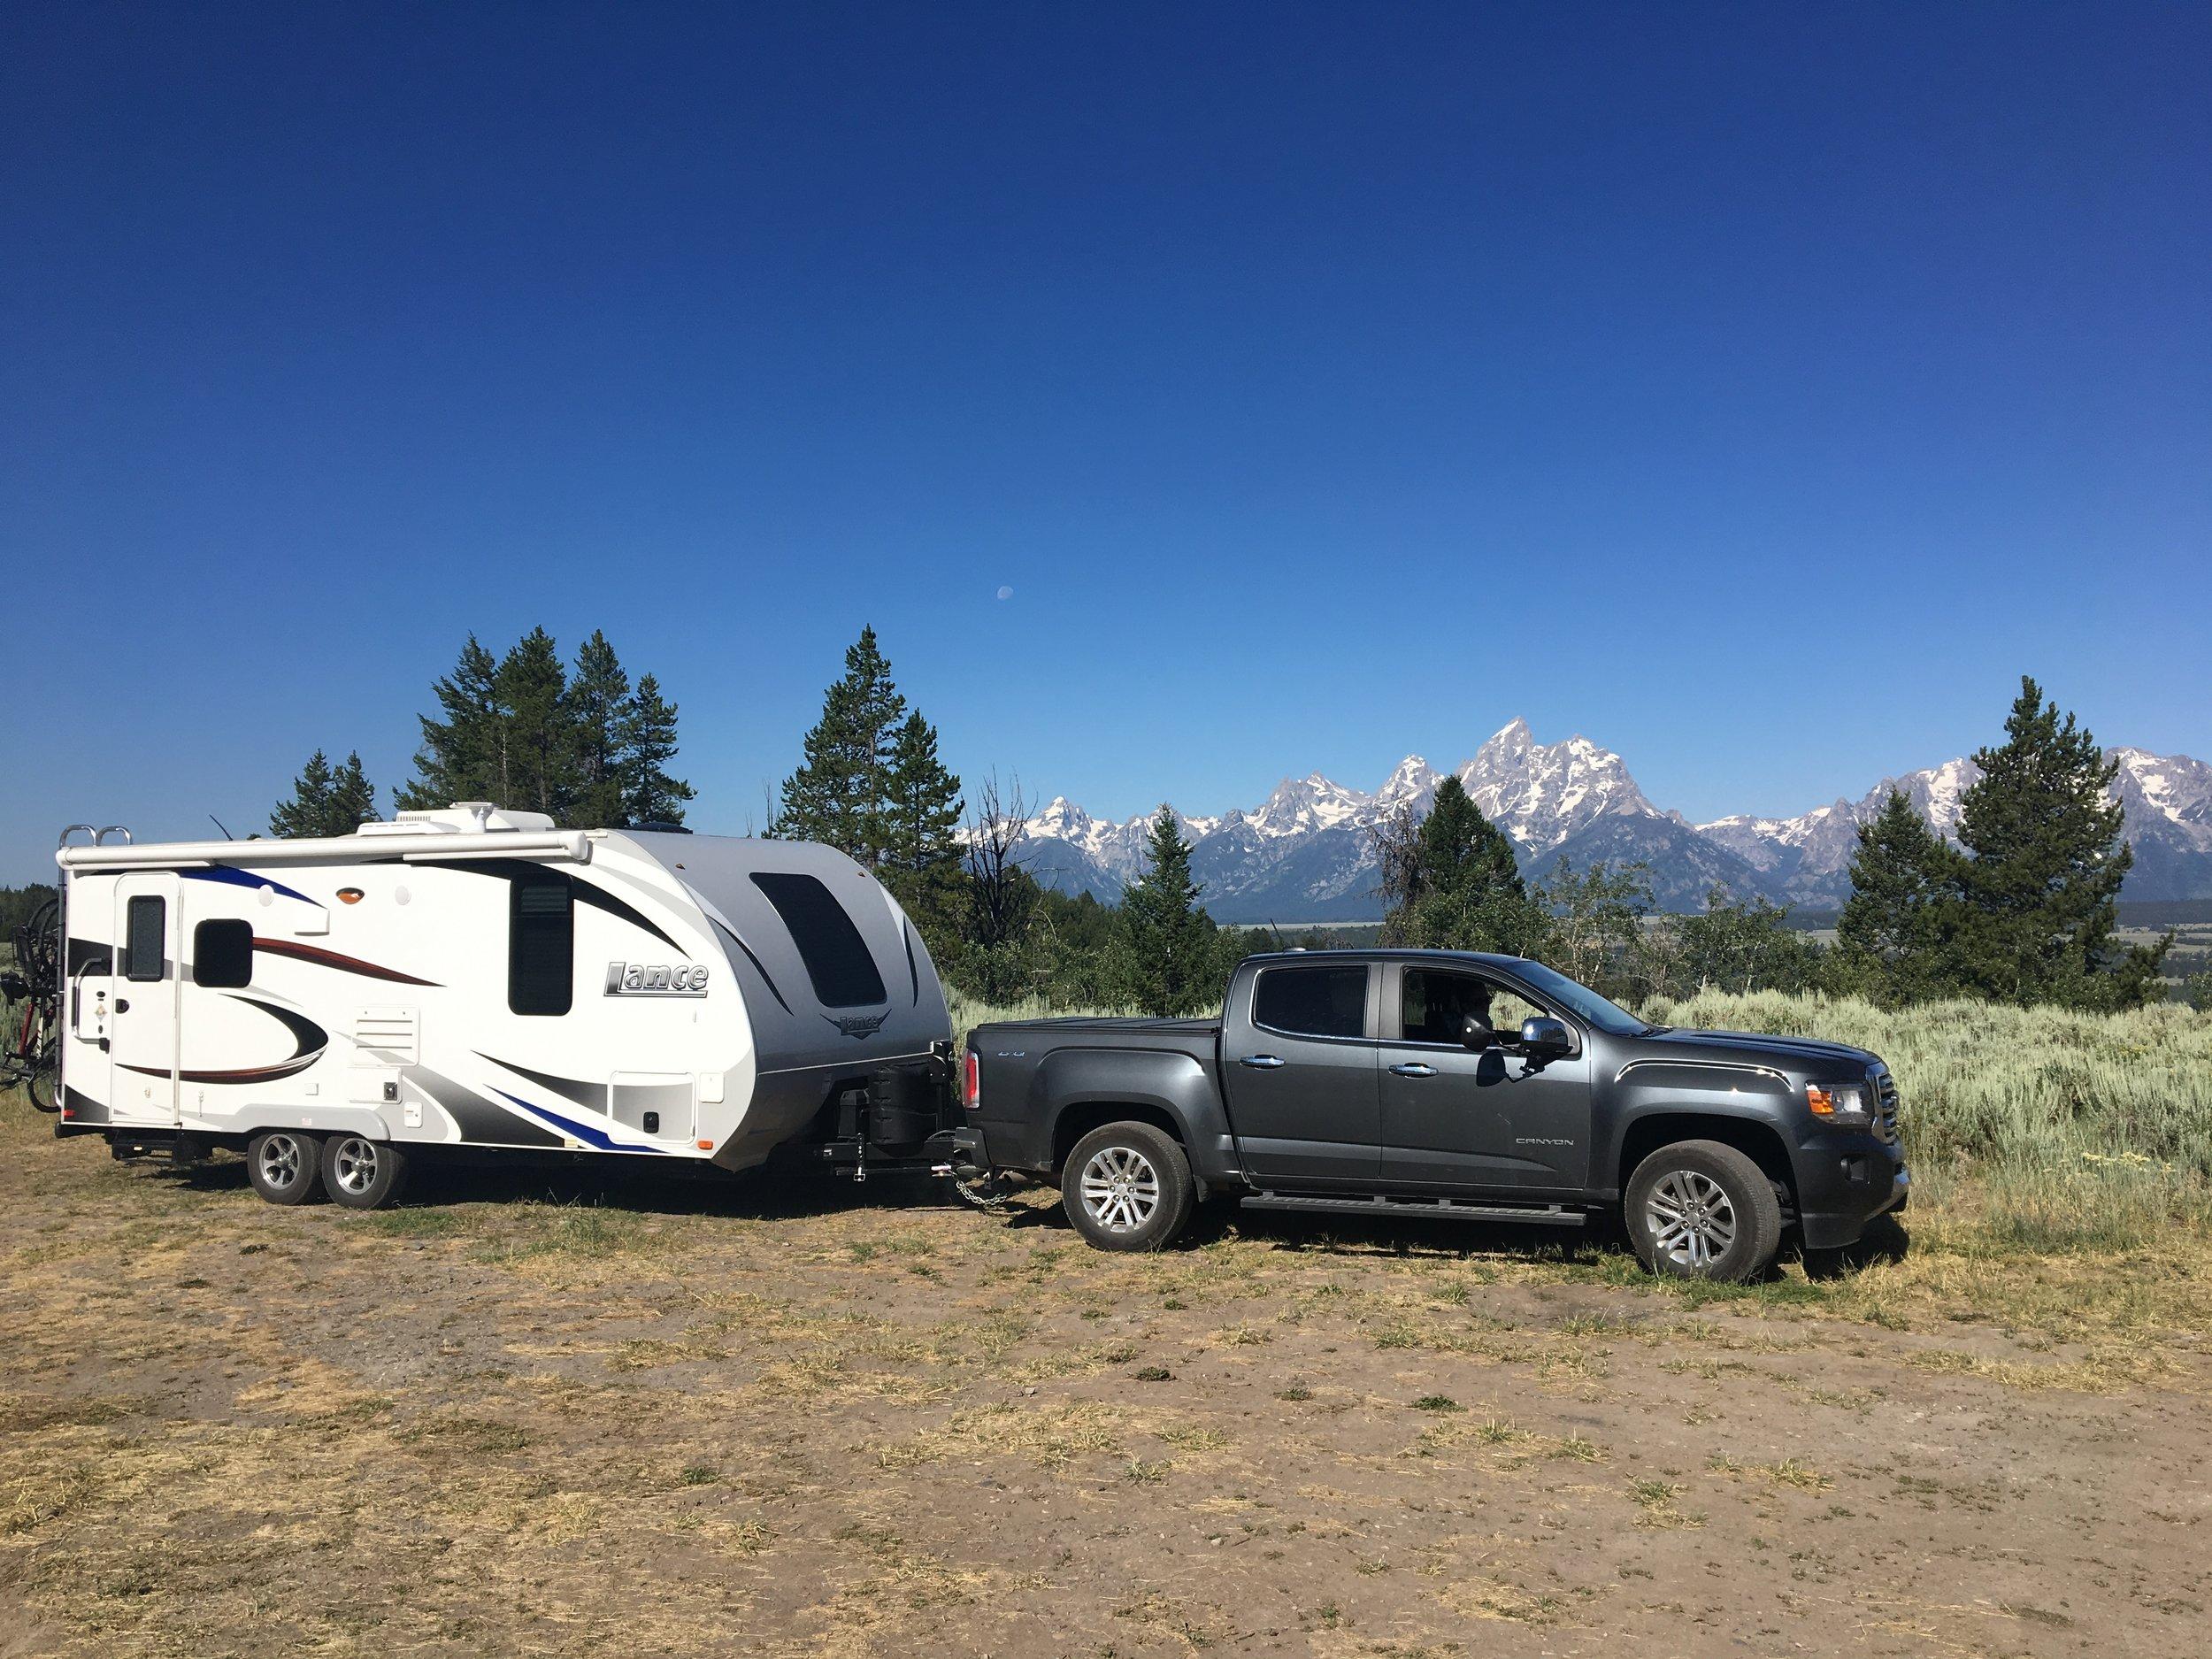 Upper View Campground, Grand Teton